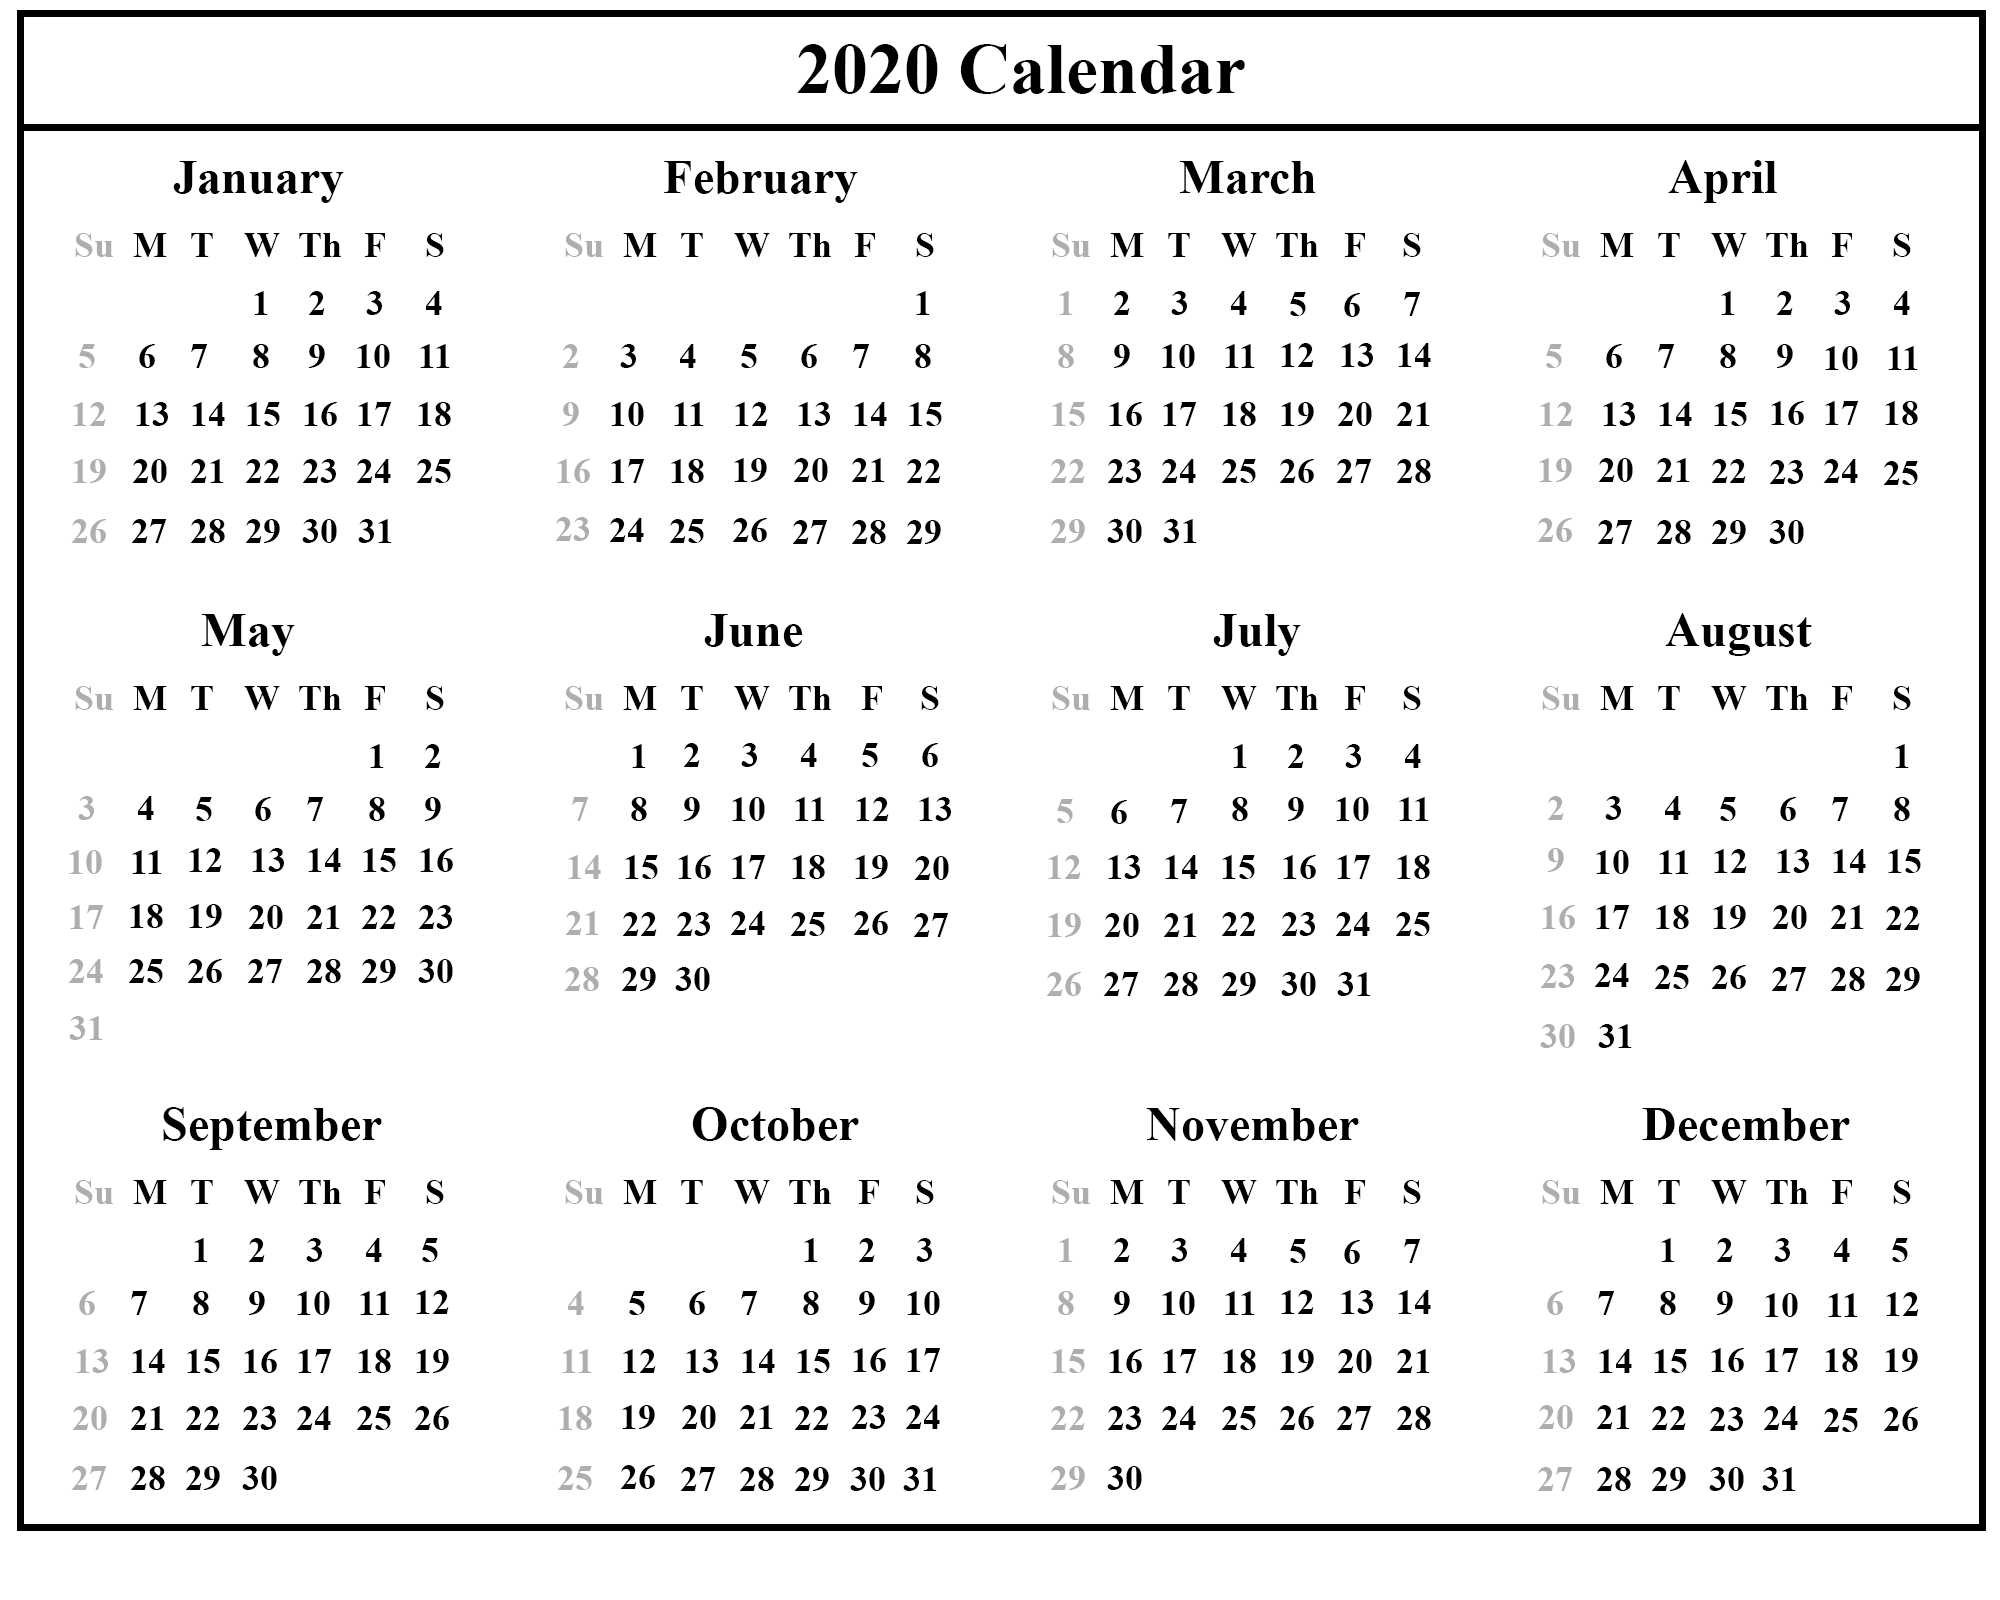 Editable 2020 Calendar Printable Template Blank With Notes  Calendar 2020 August-December